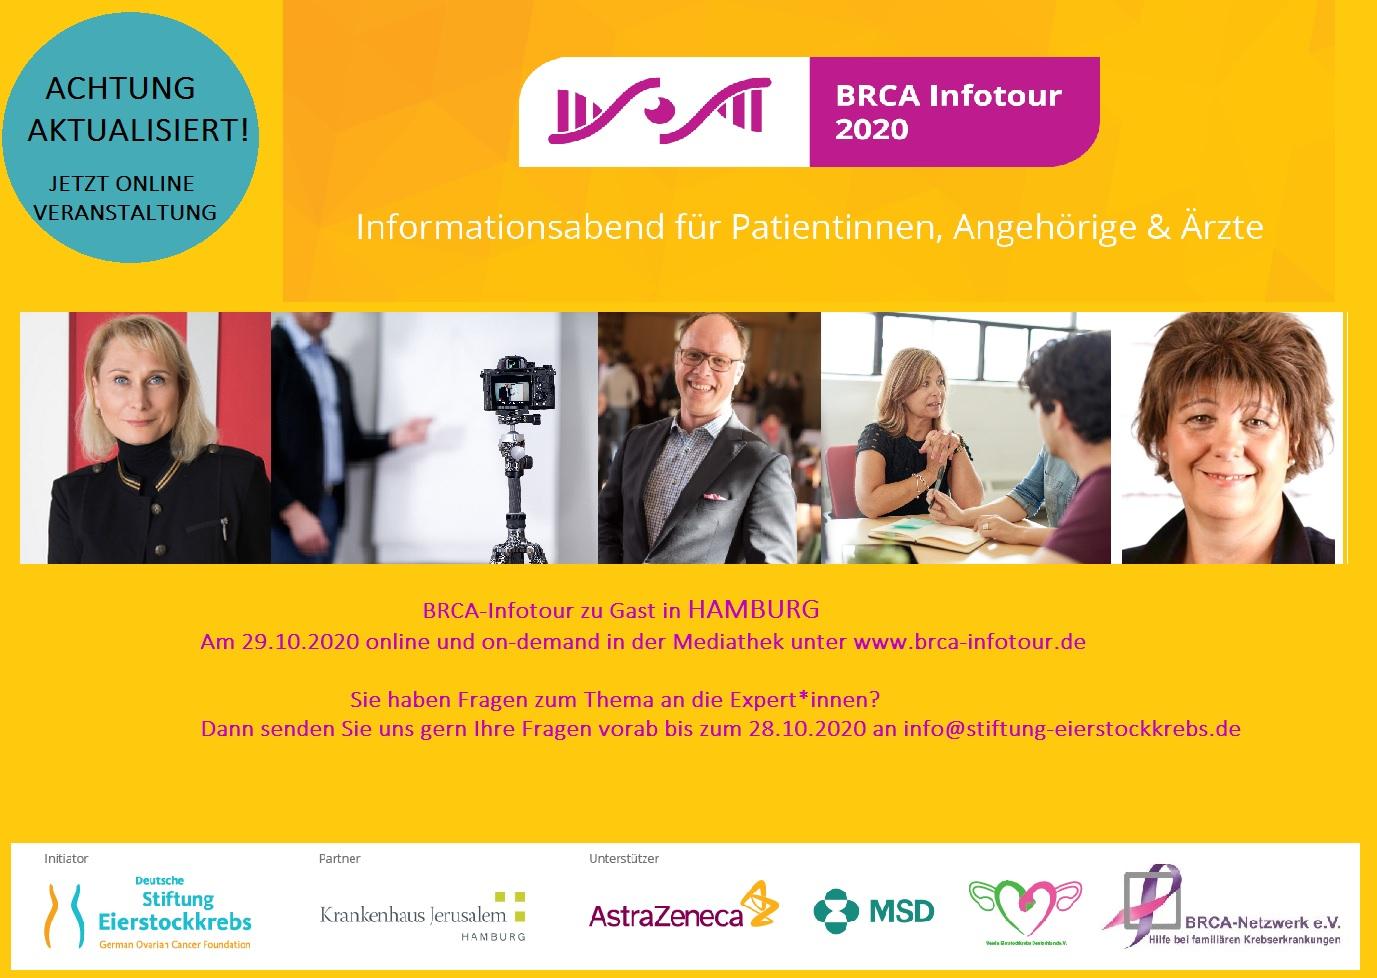 BRCA Infotour Hamburg